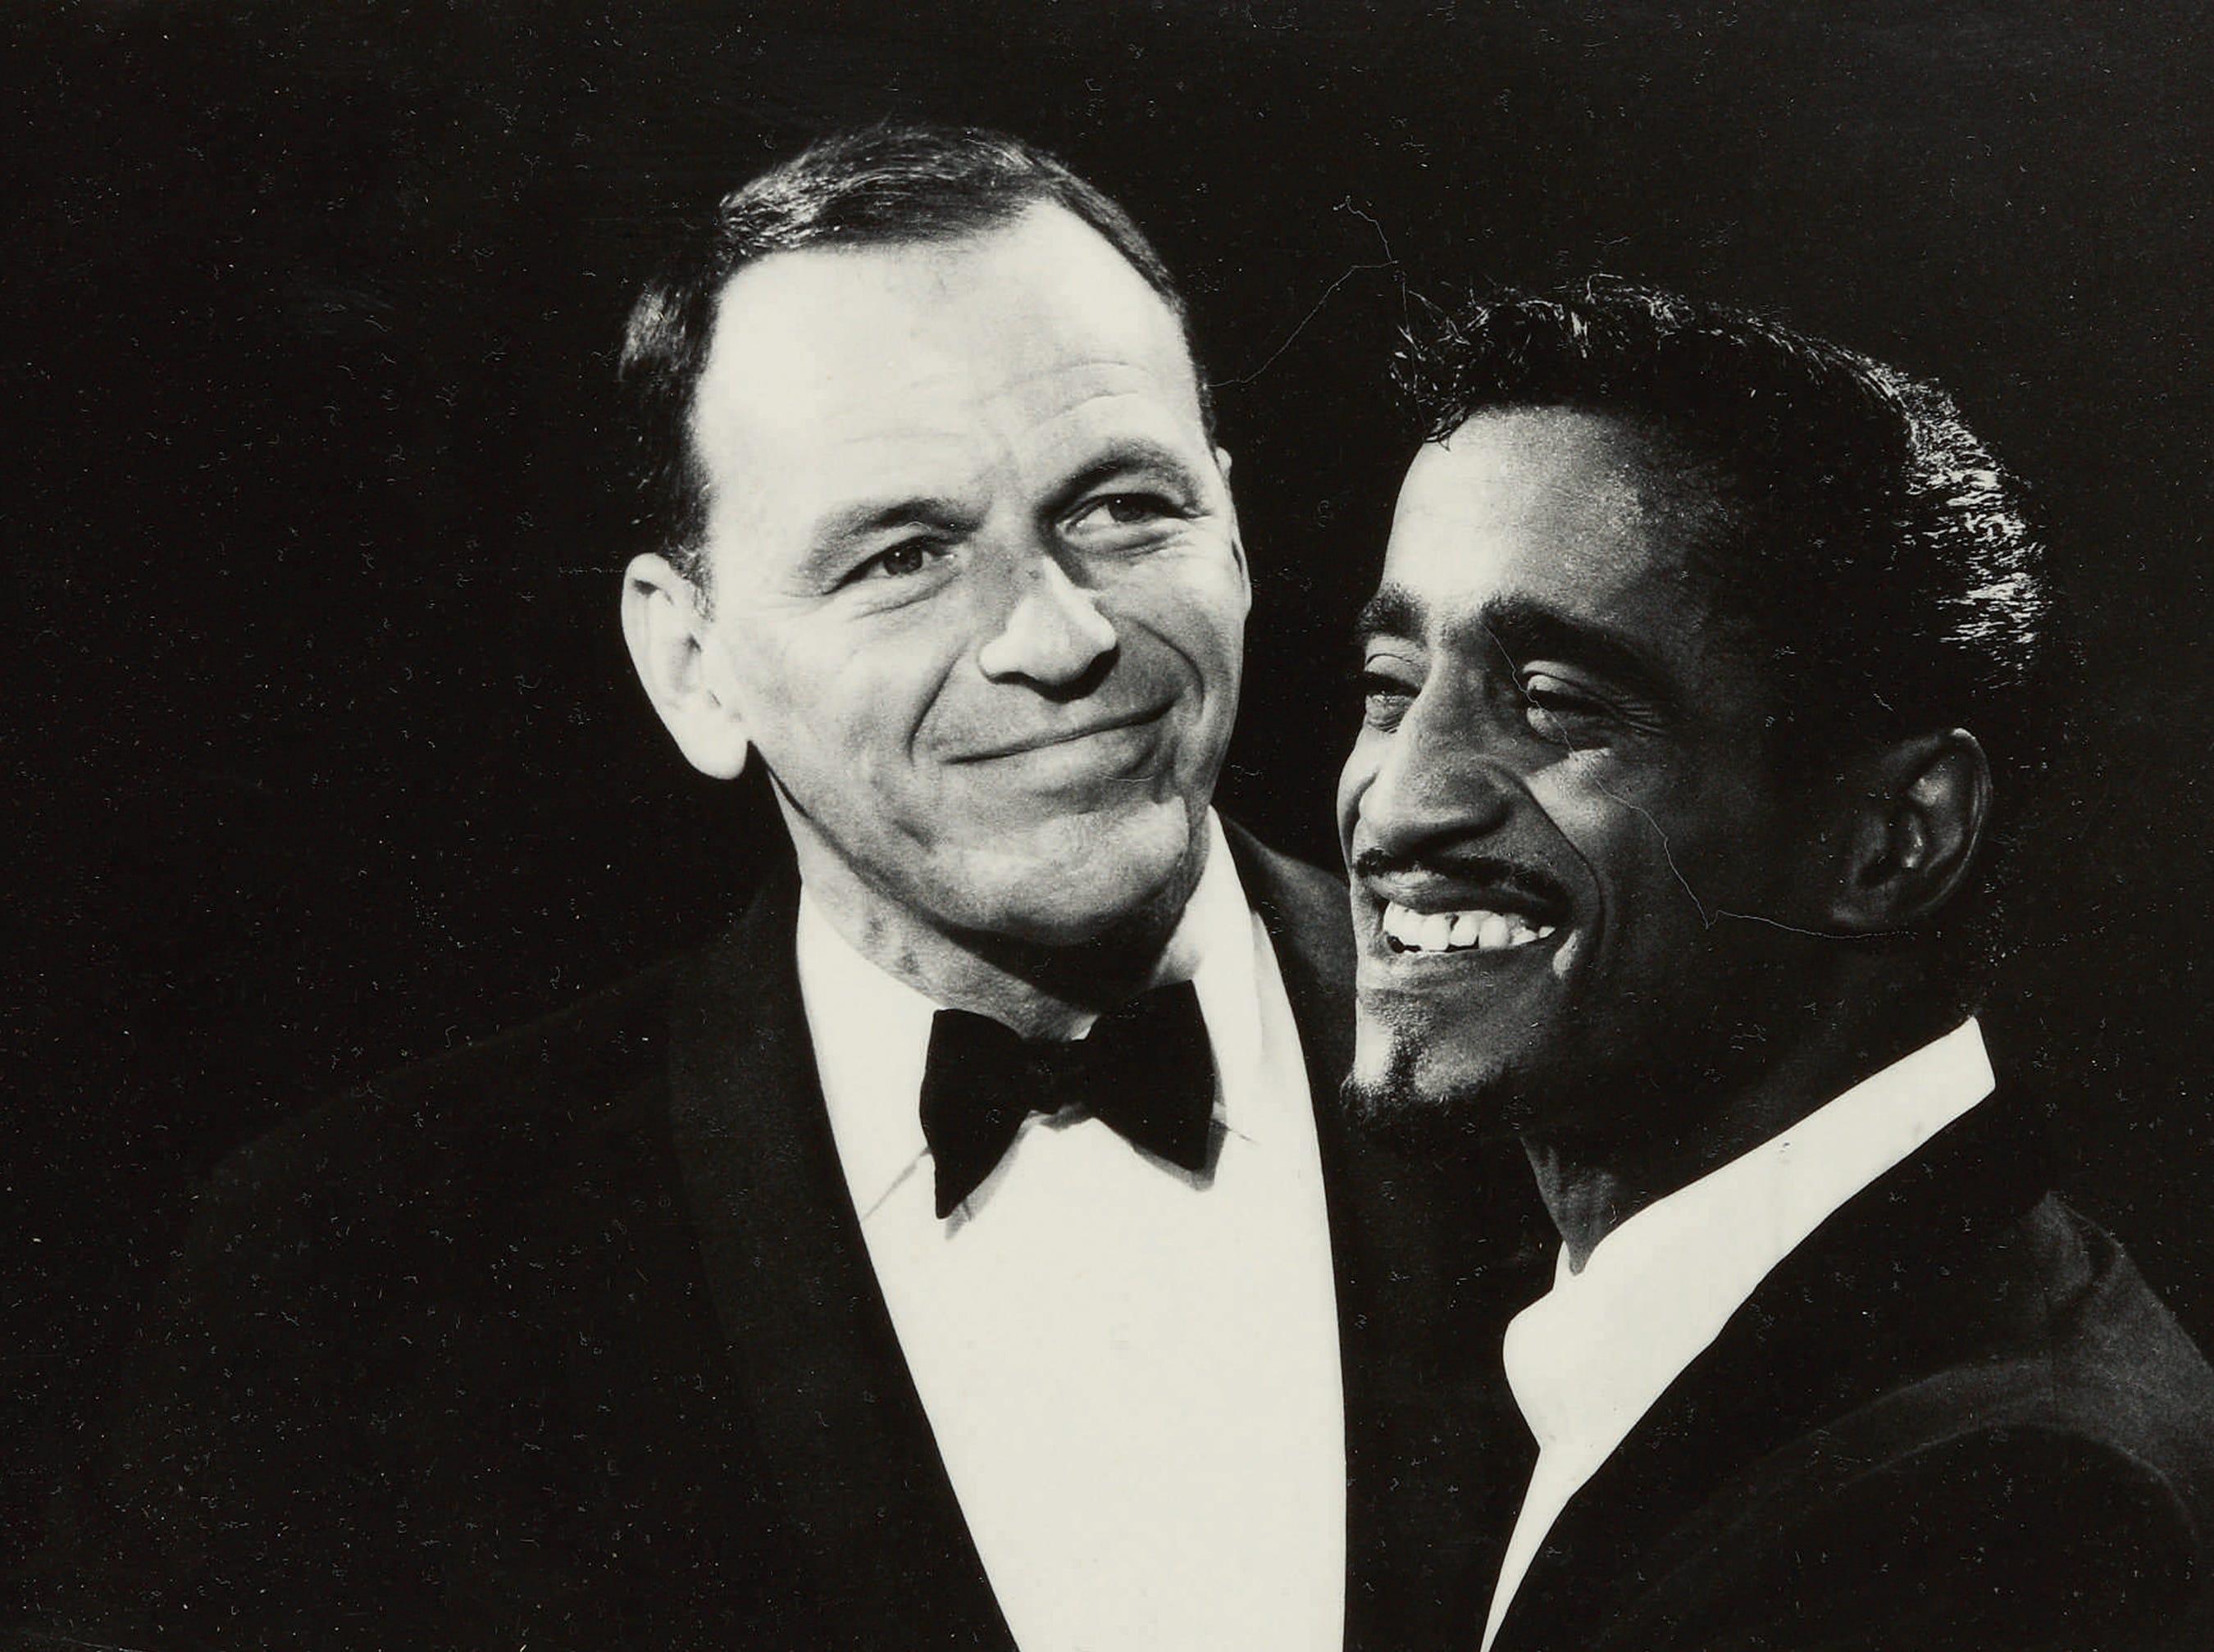 Frank Sinatra and Sammy Davis